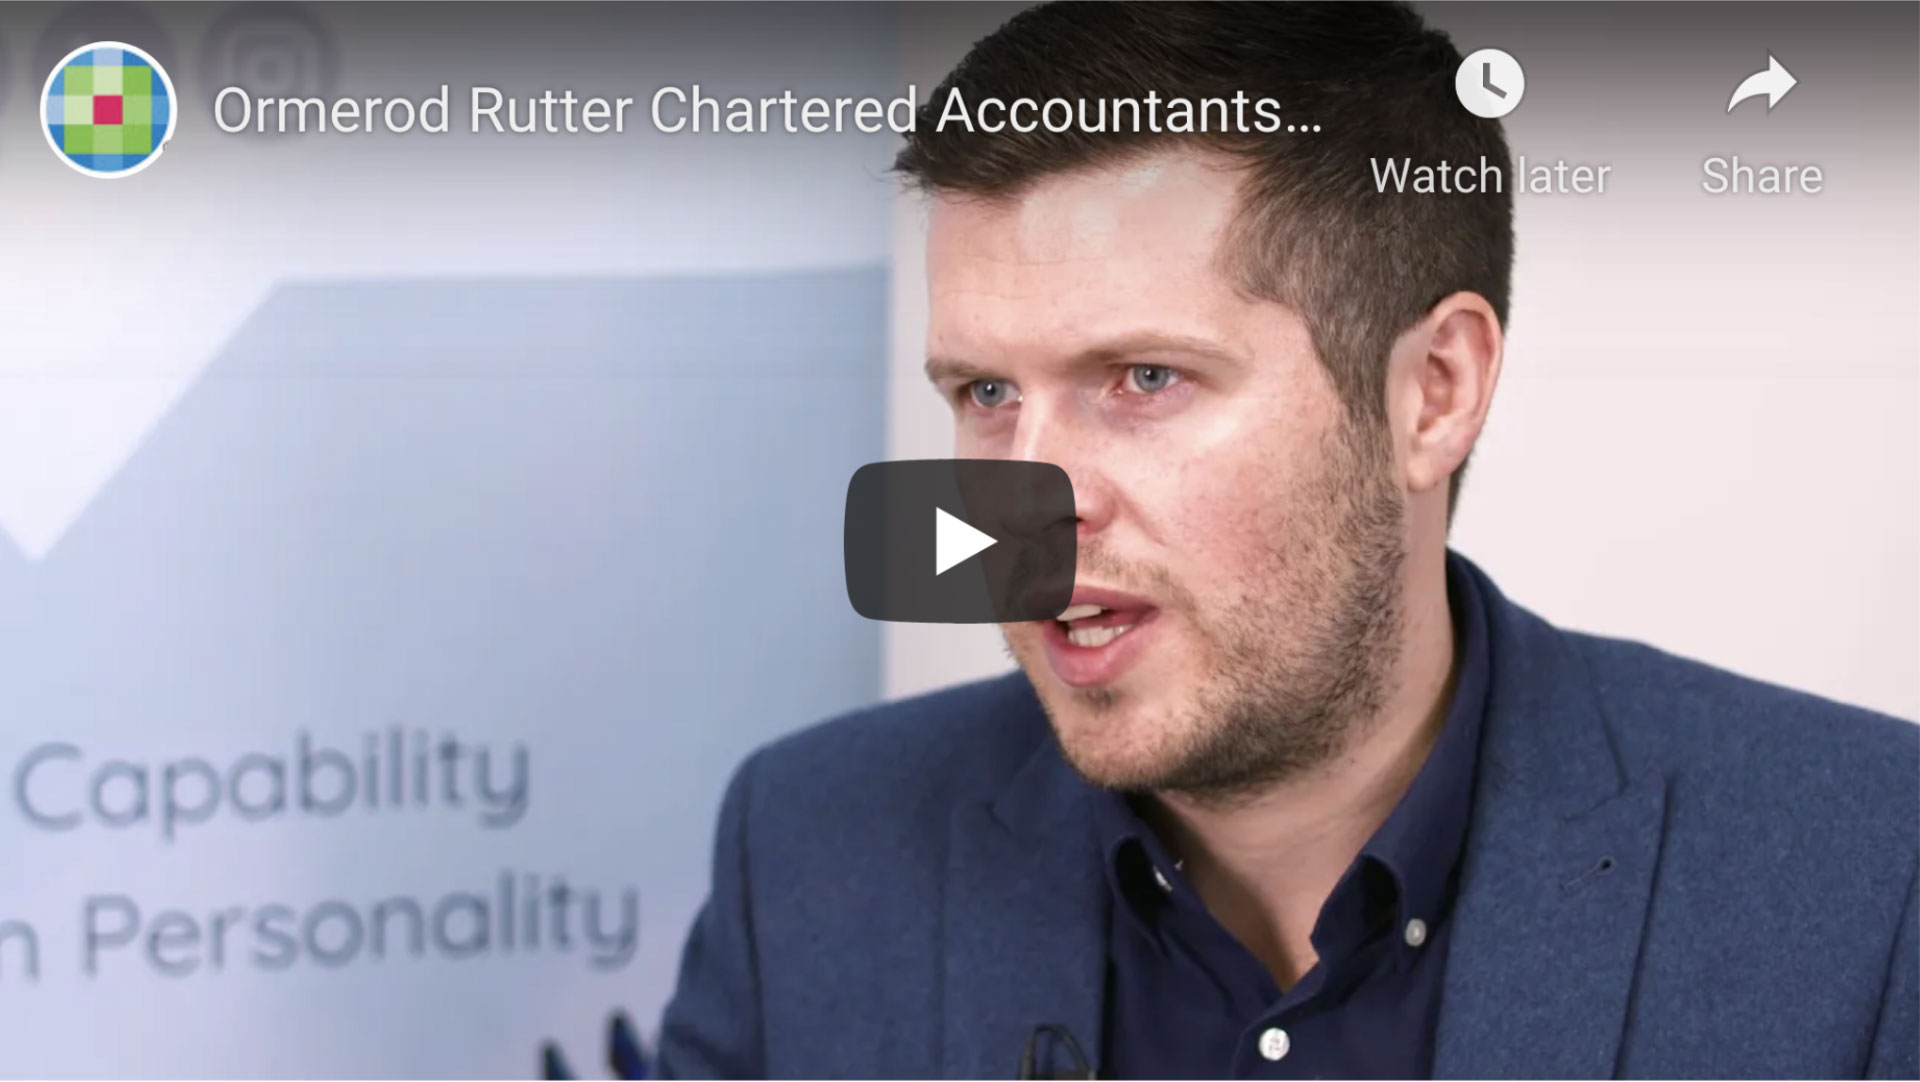 Ormerod Rutter Video Case Study